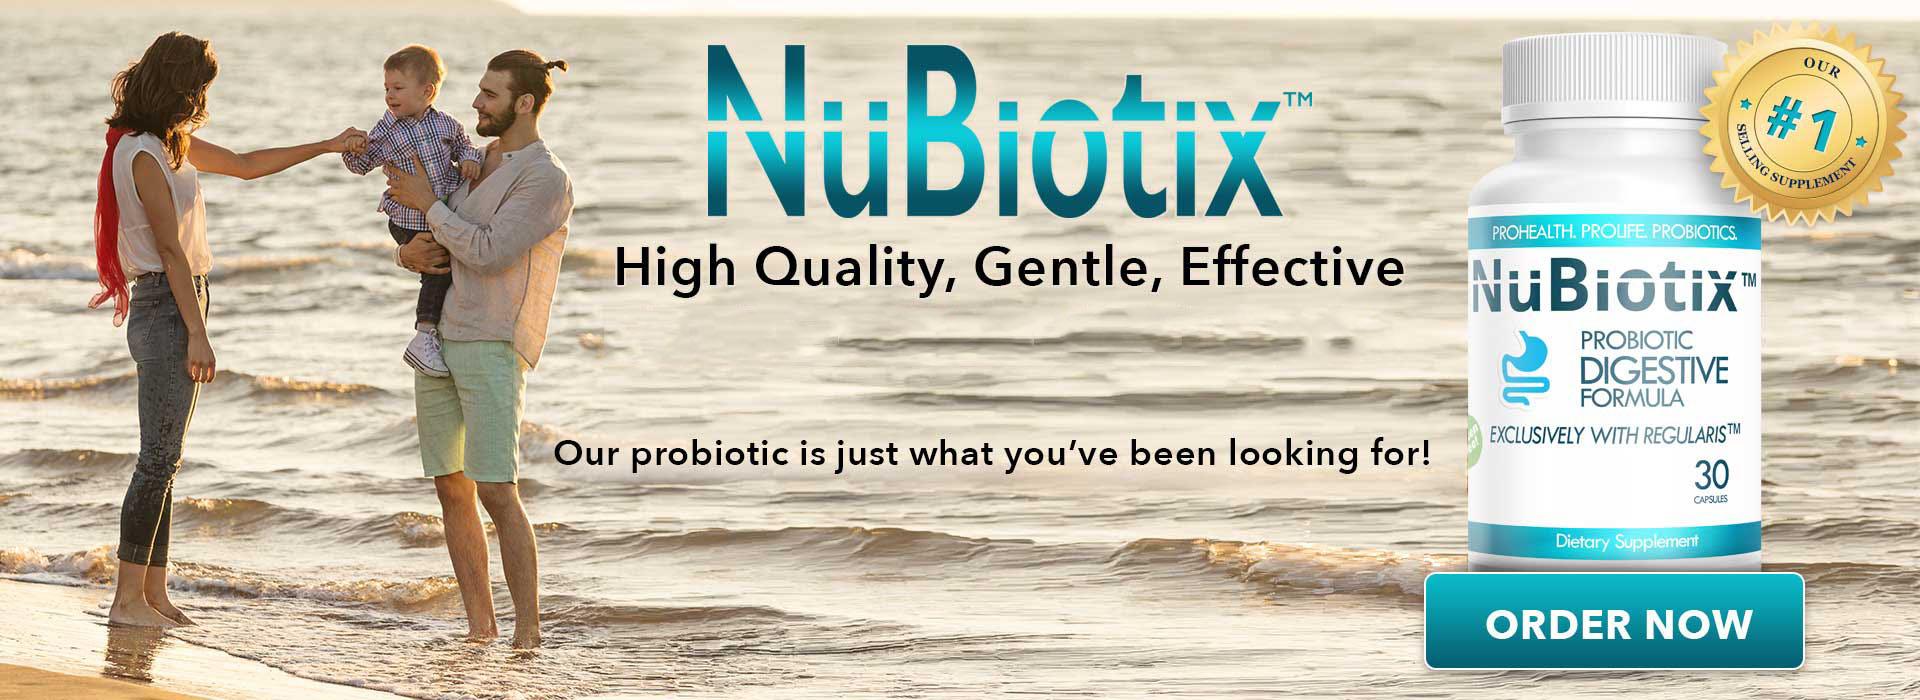 nubiotix_banner_footer_charlie